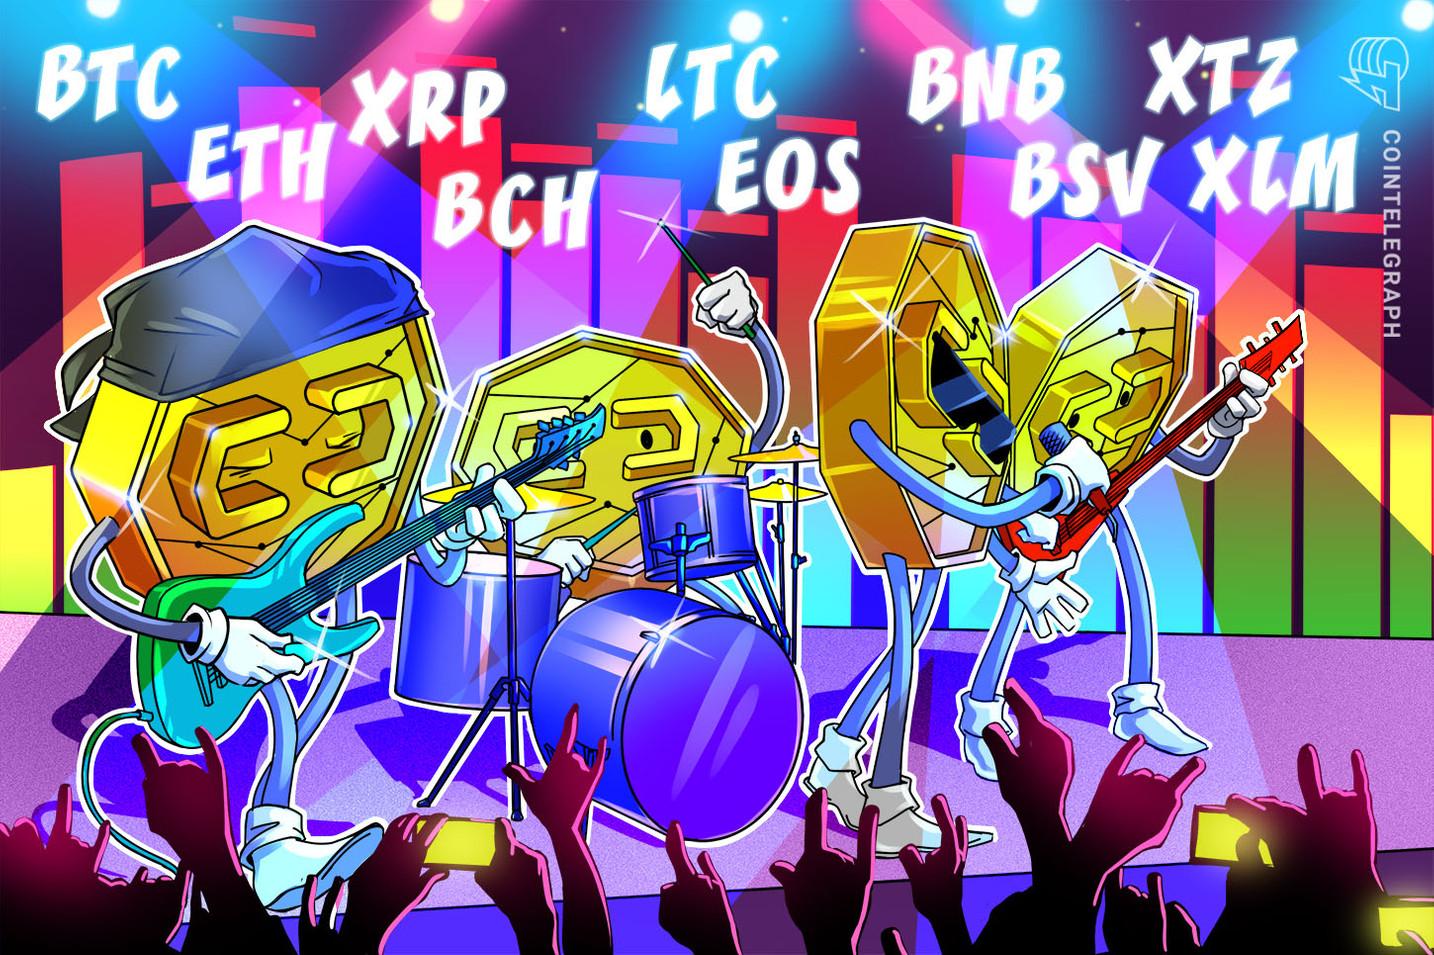 Análise de preços, 20/12: BTC, ETH, XRP, BCH, LTC, EOS, BNB, BSV, XTZ, XLM